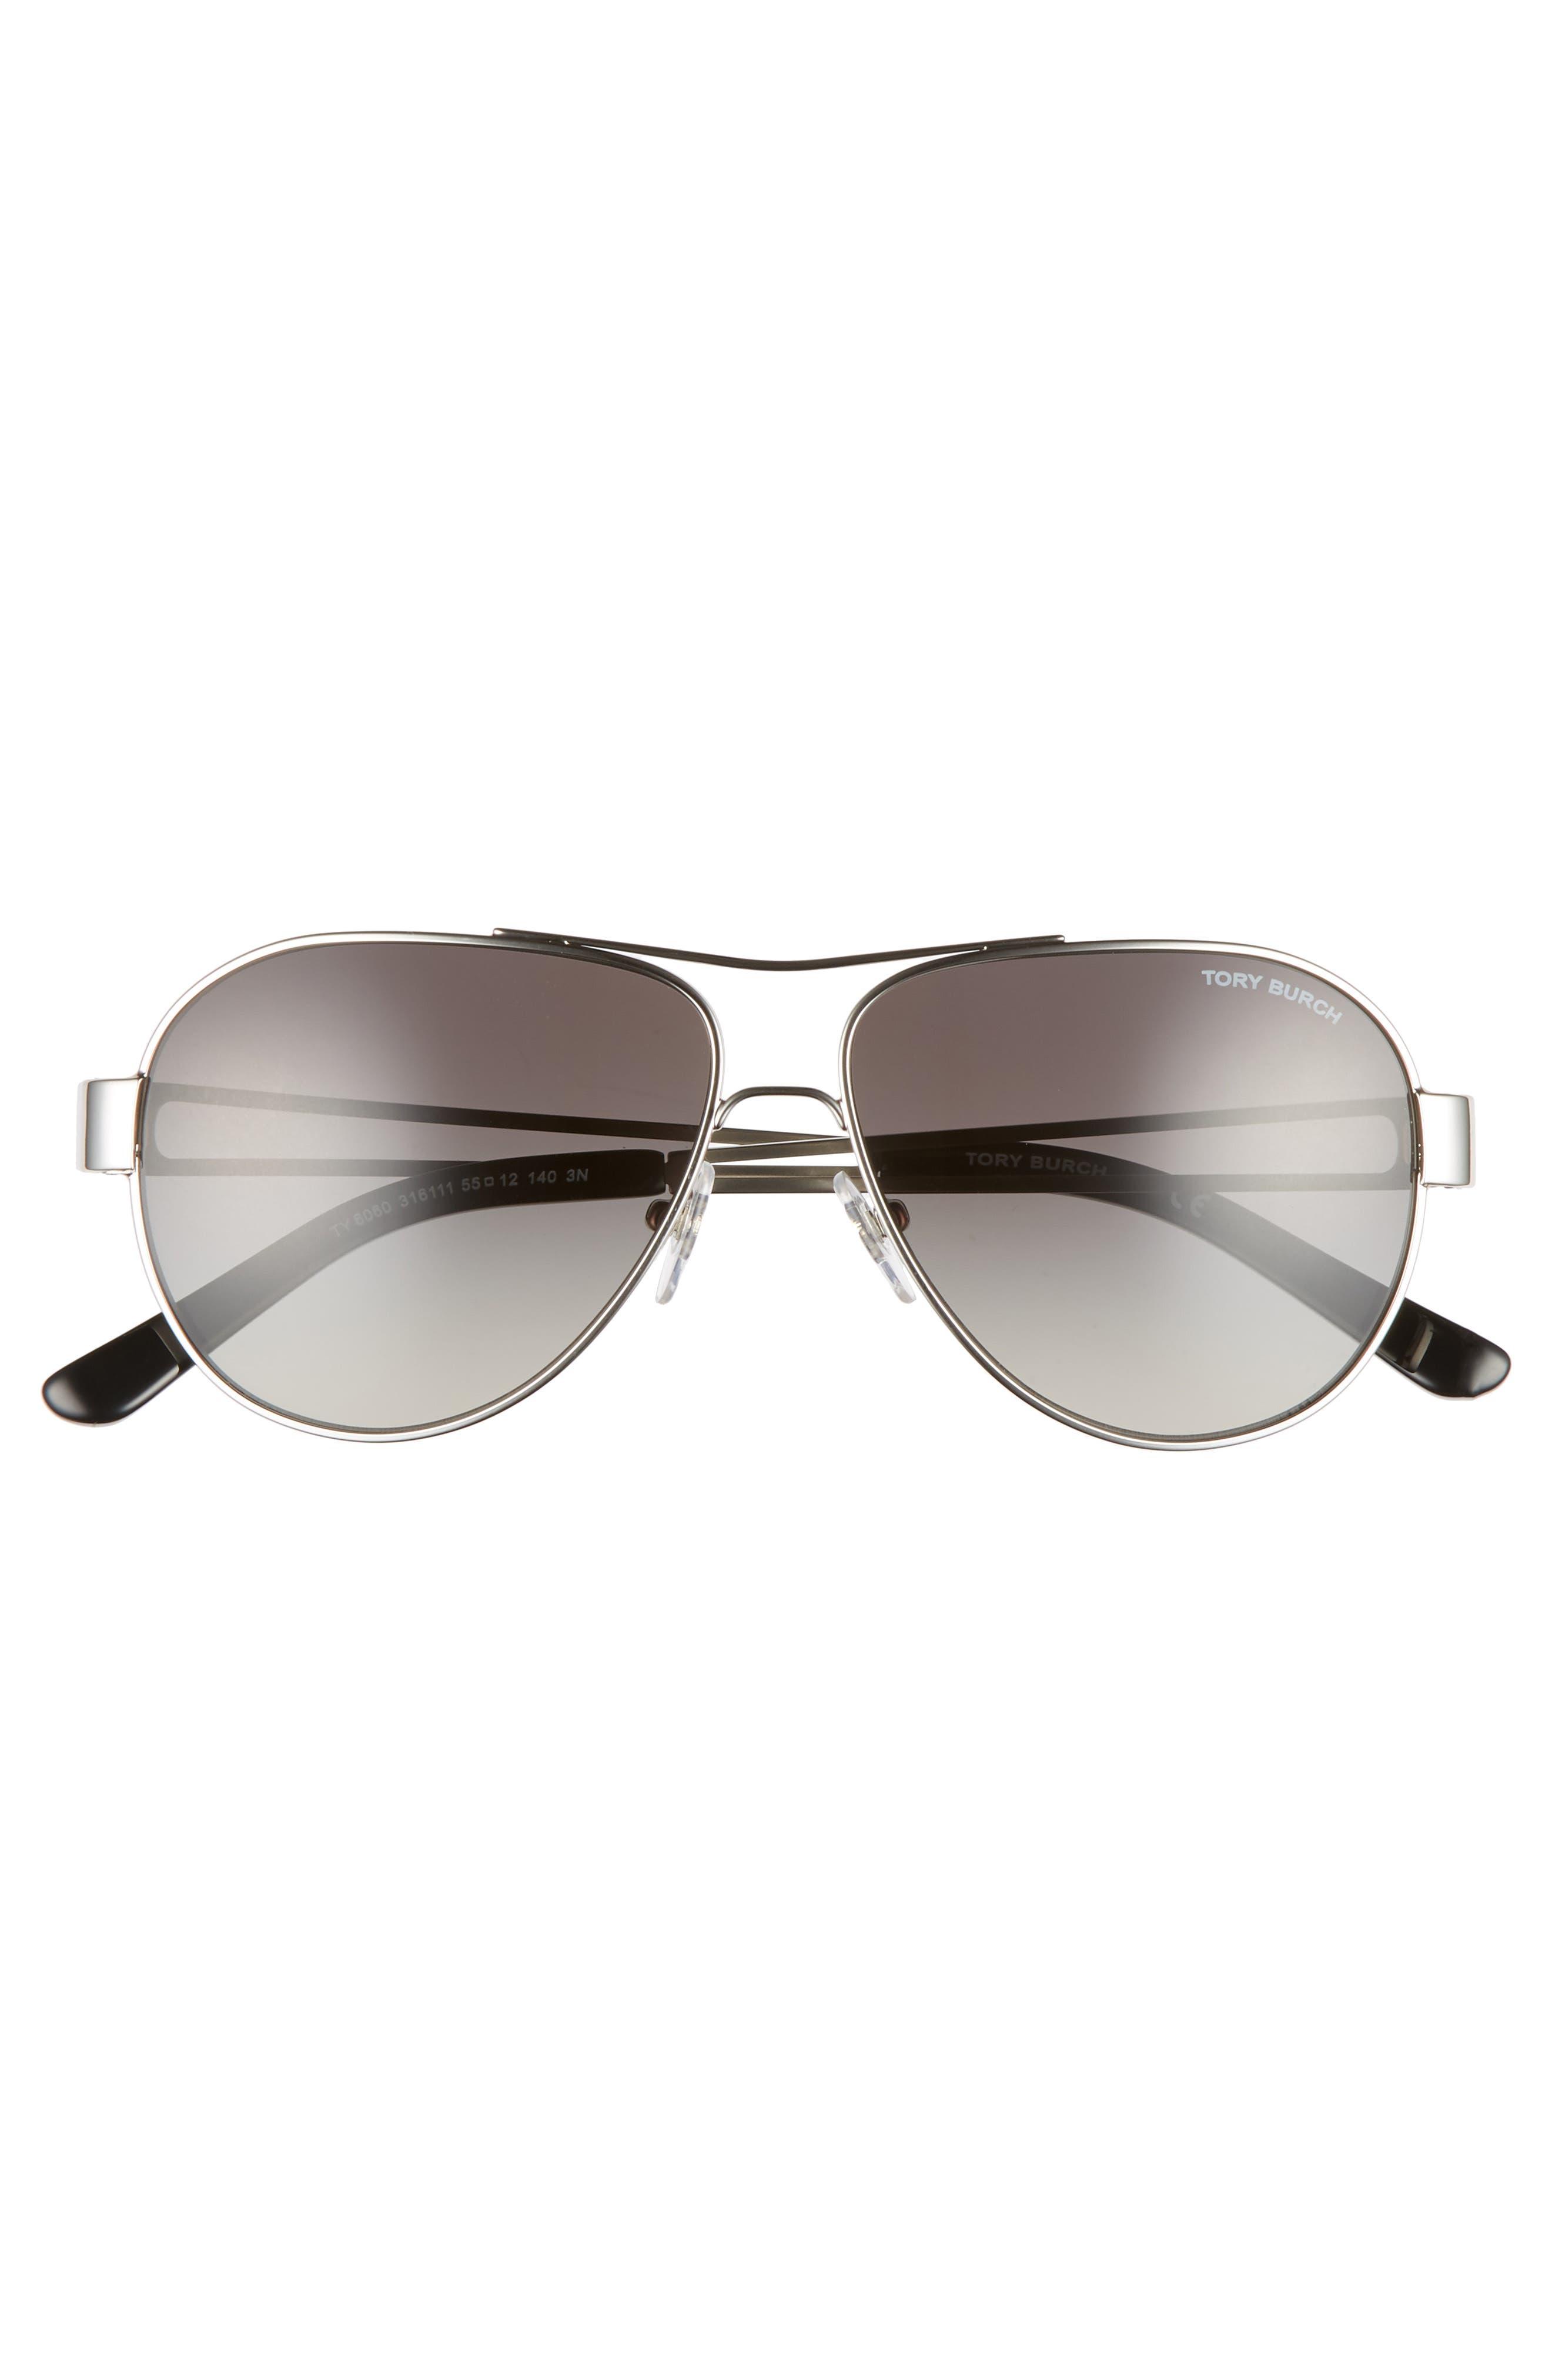 55mm Polarized Aviator Sunglasses,                             Alternate thumbnail 3, color,                             Silver/ Black Gradient